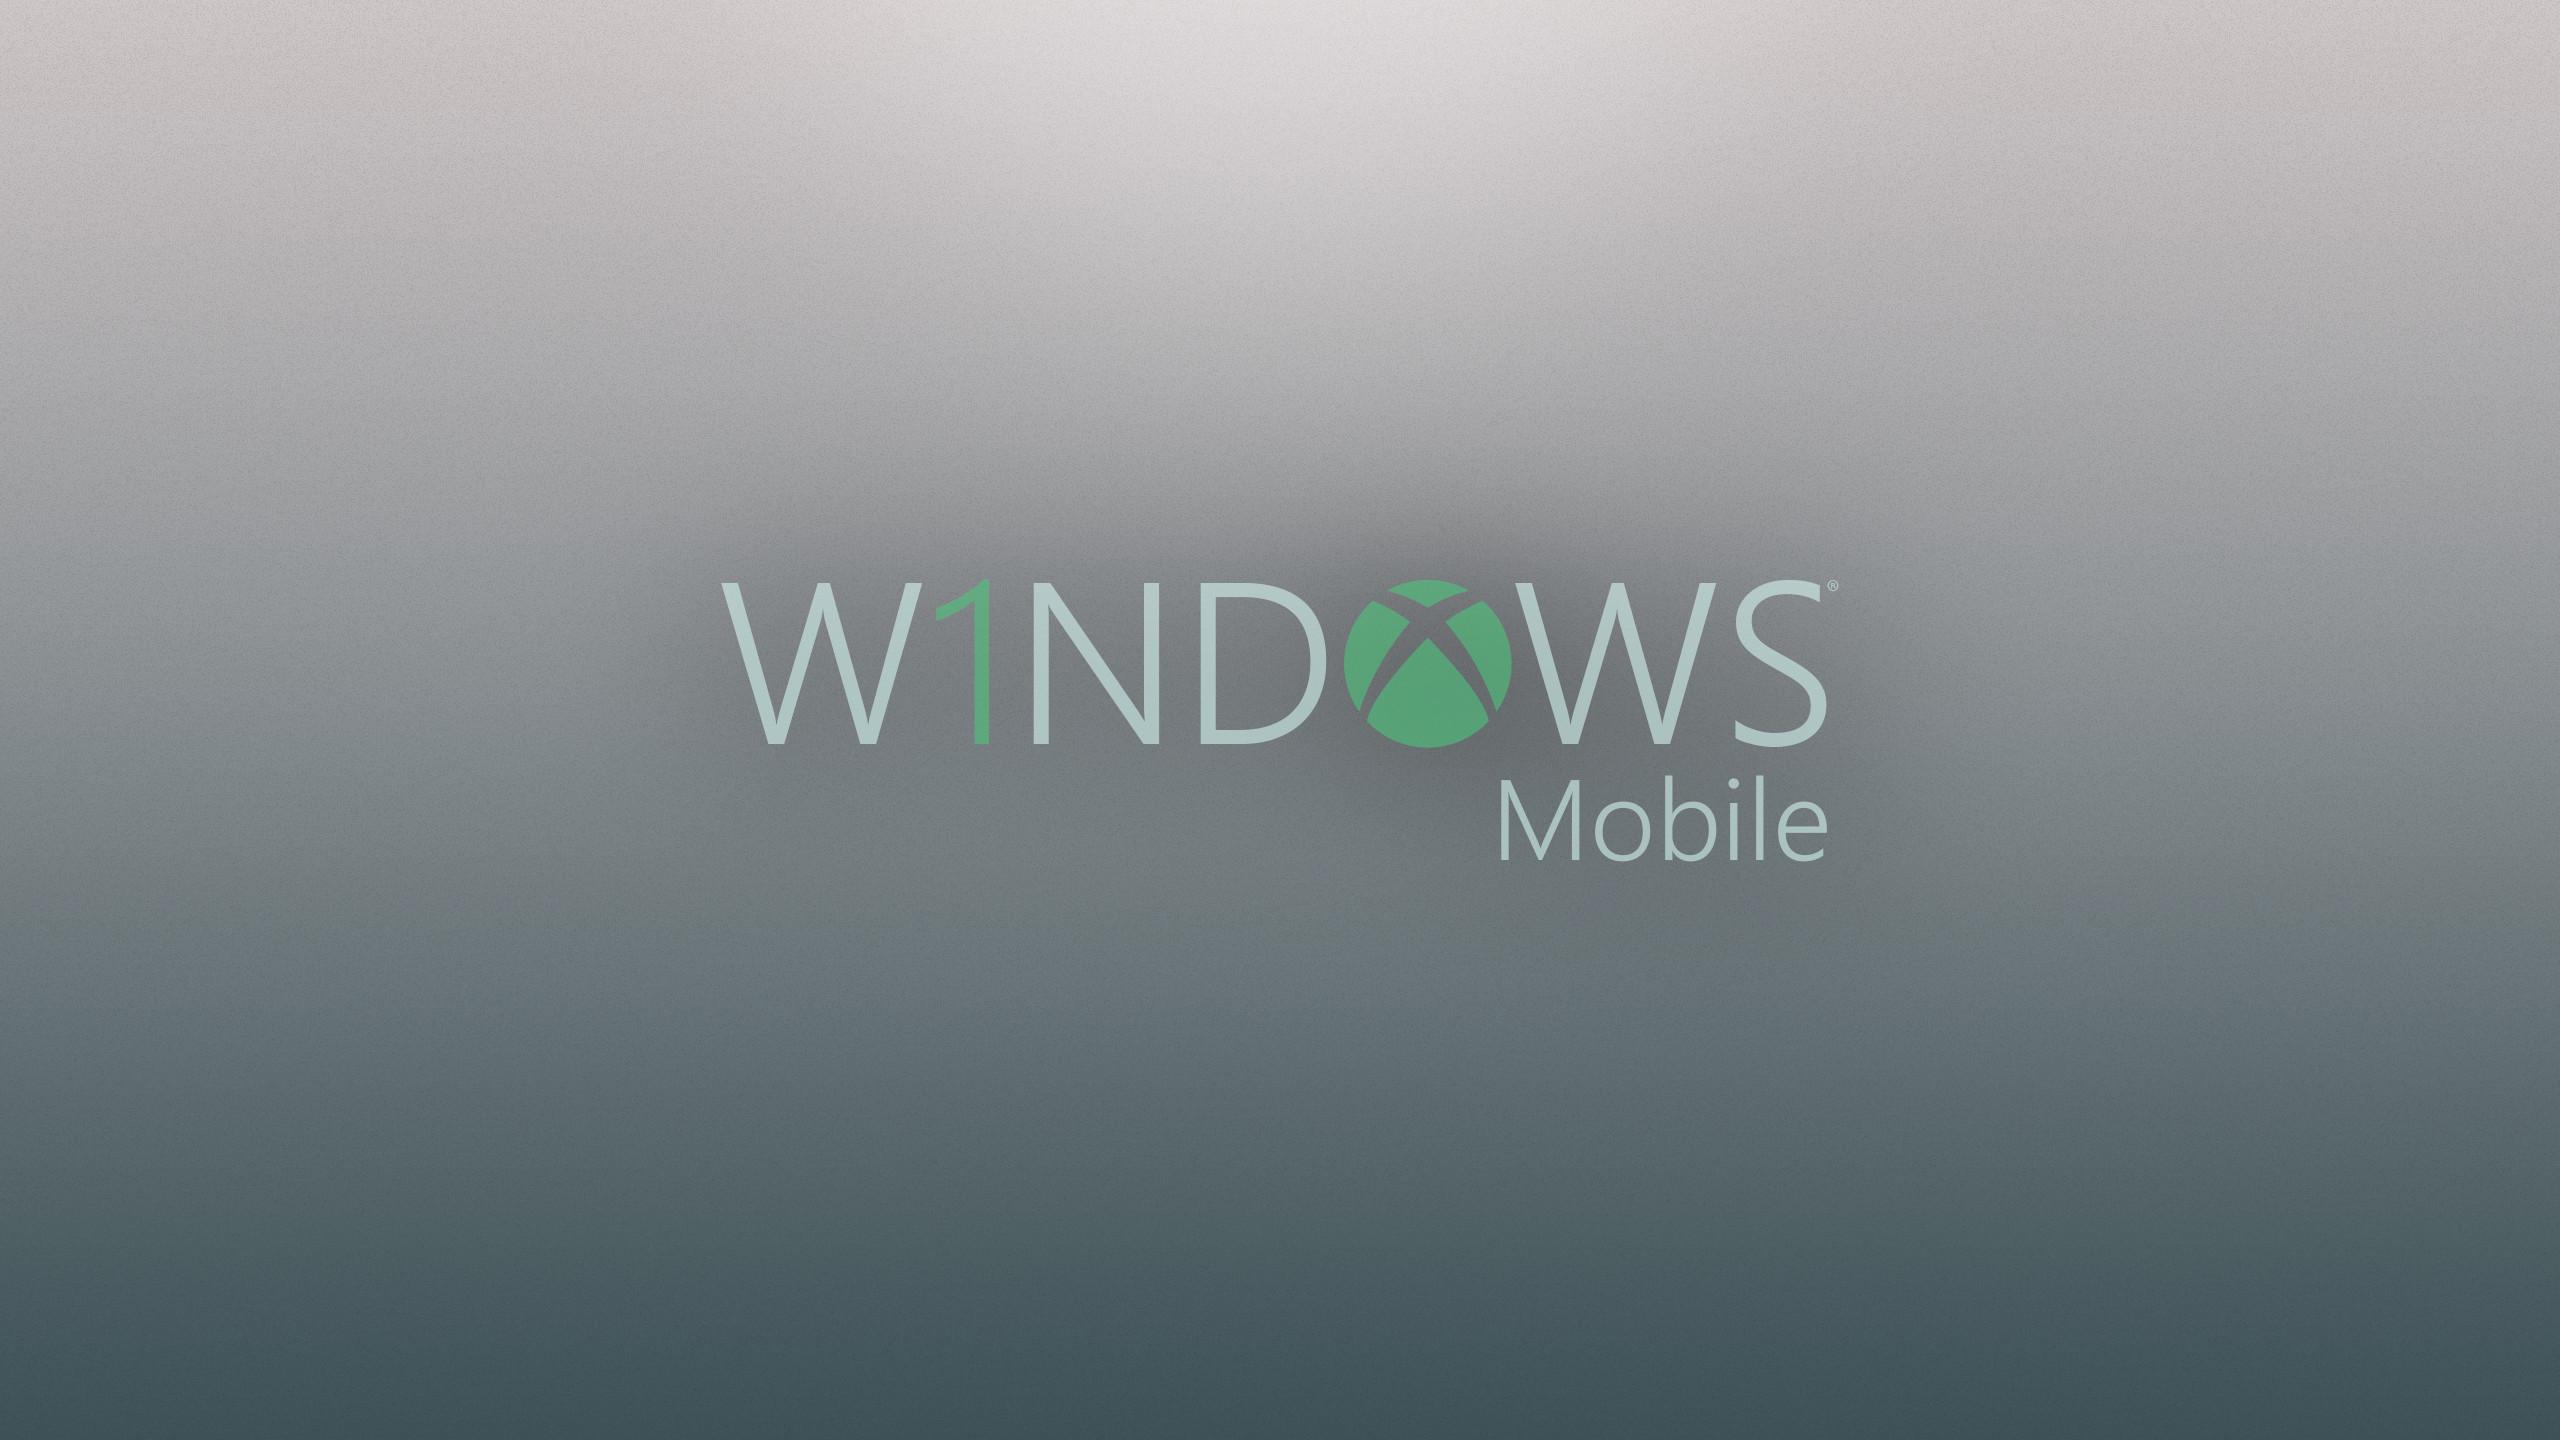 Windows 10 Mobile by ljdesigner Windows 10 Mobile by ljdesigner